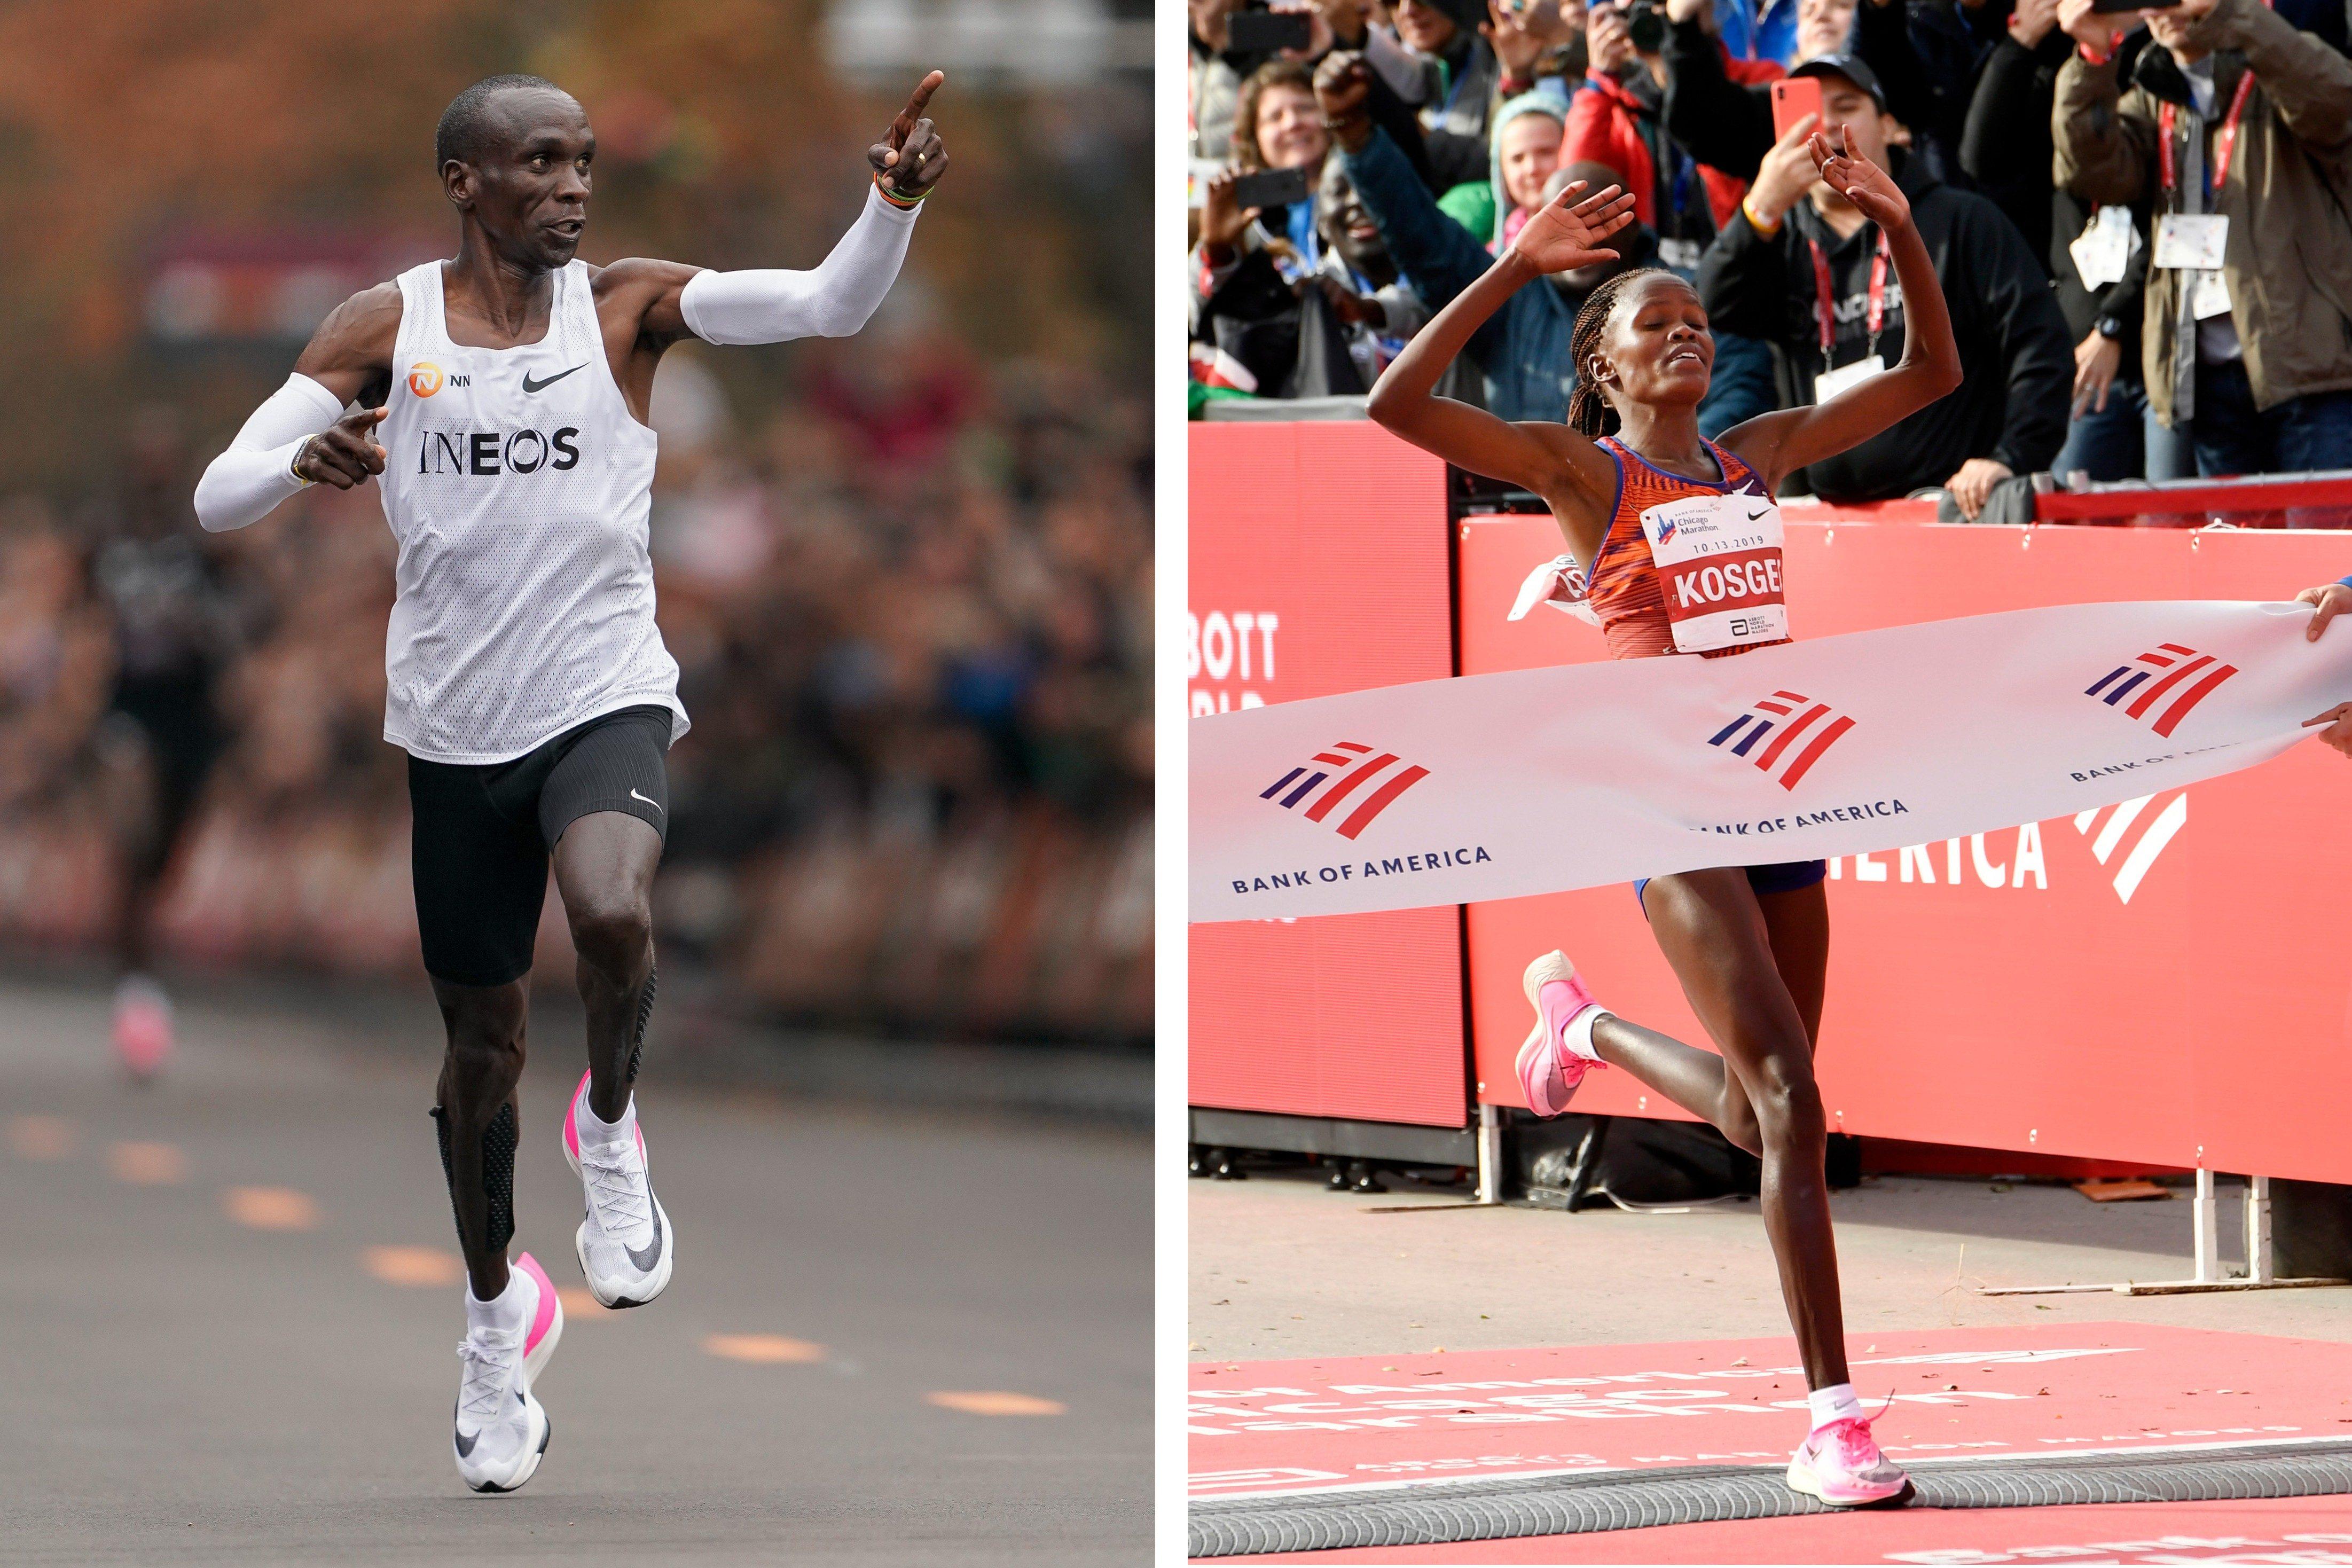 Mandatory Credit: Photo by Paul Beaty/AP/Shutterstock (10443079e) Brigid Kosgei of Kenya, wins the Women's Bank of America Chicago Marathon while setting a world record of 2:14:04, in Chicago Marathon, Chicago, USA - 13 Oct 2019